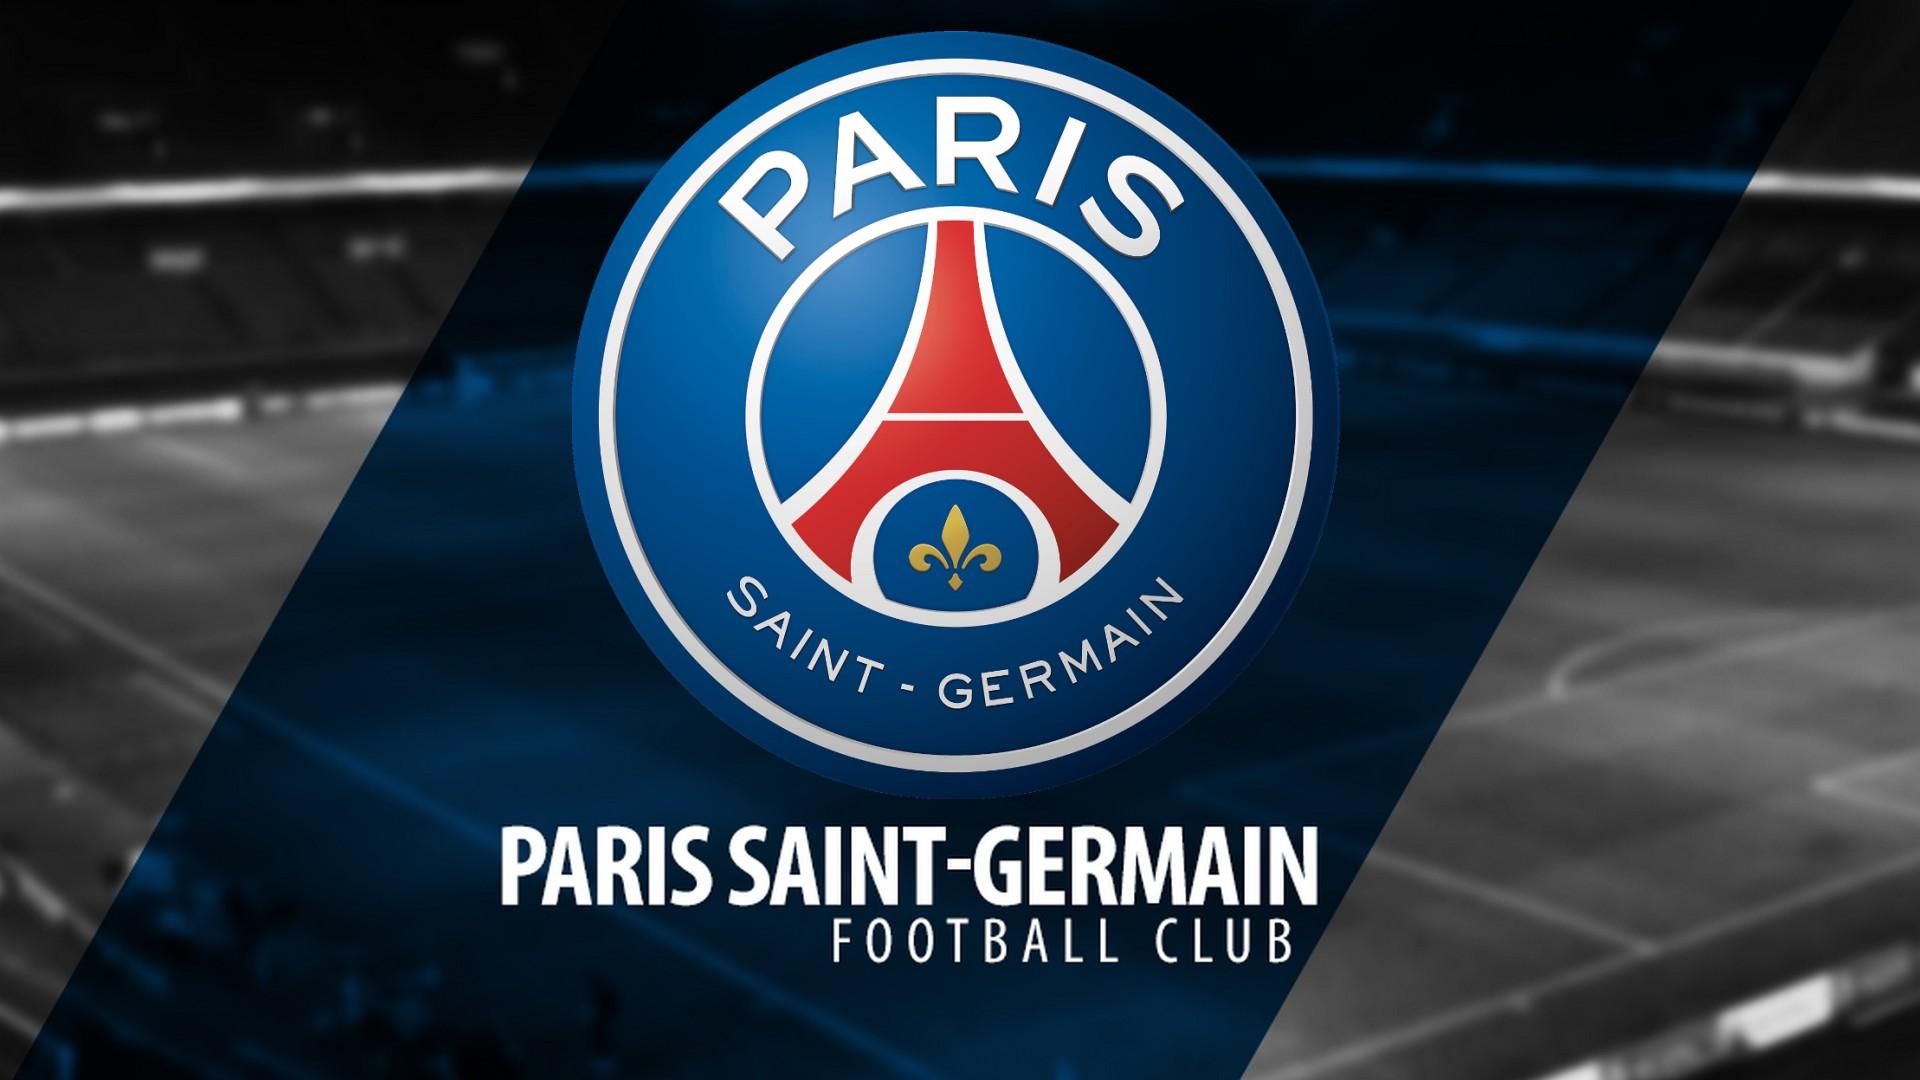 paris saint germain wallpaper hd 2021